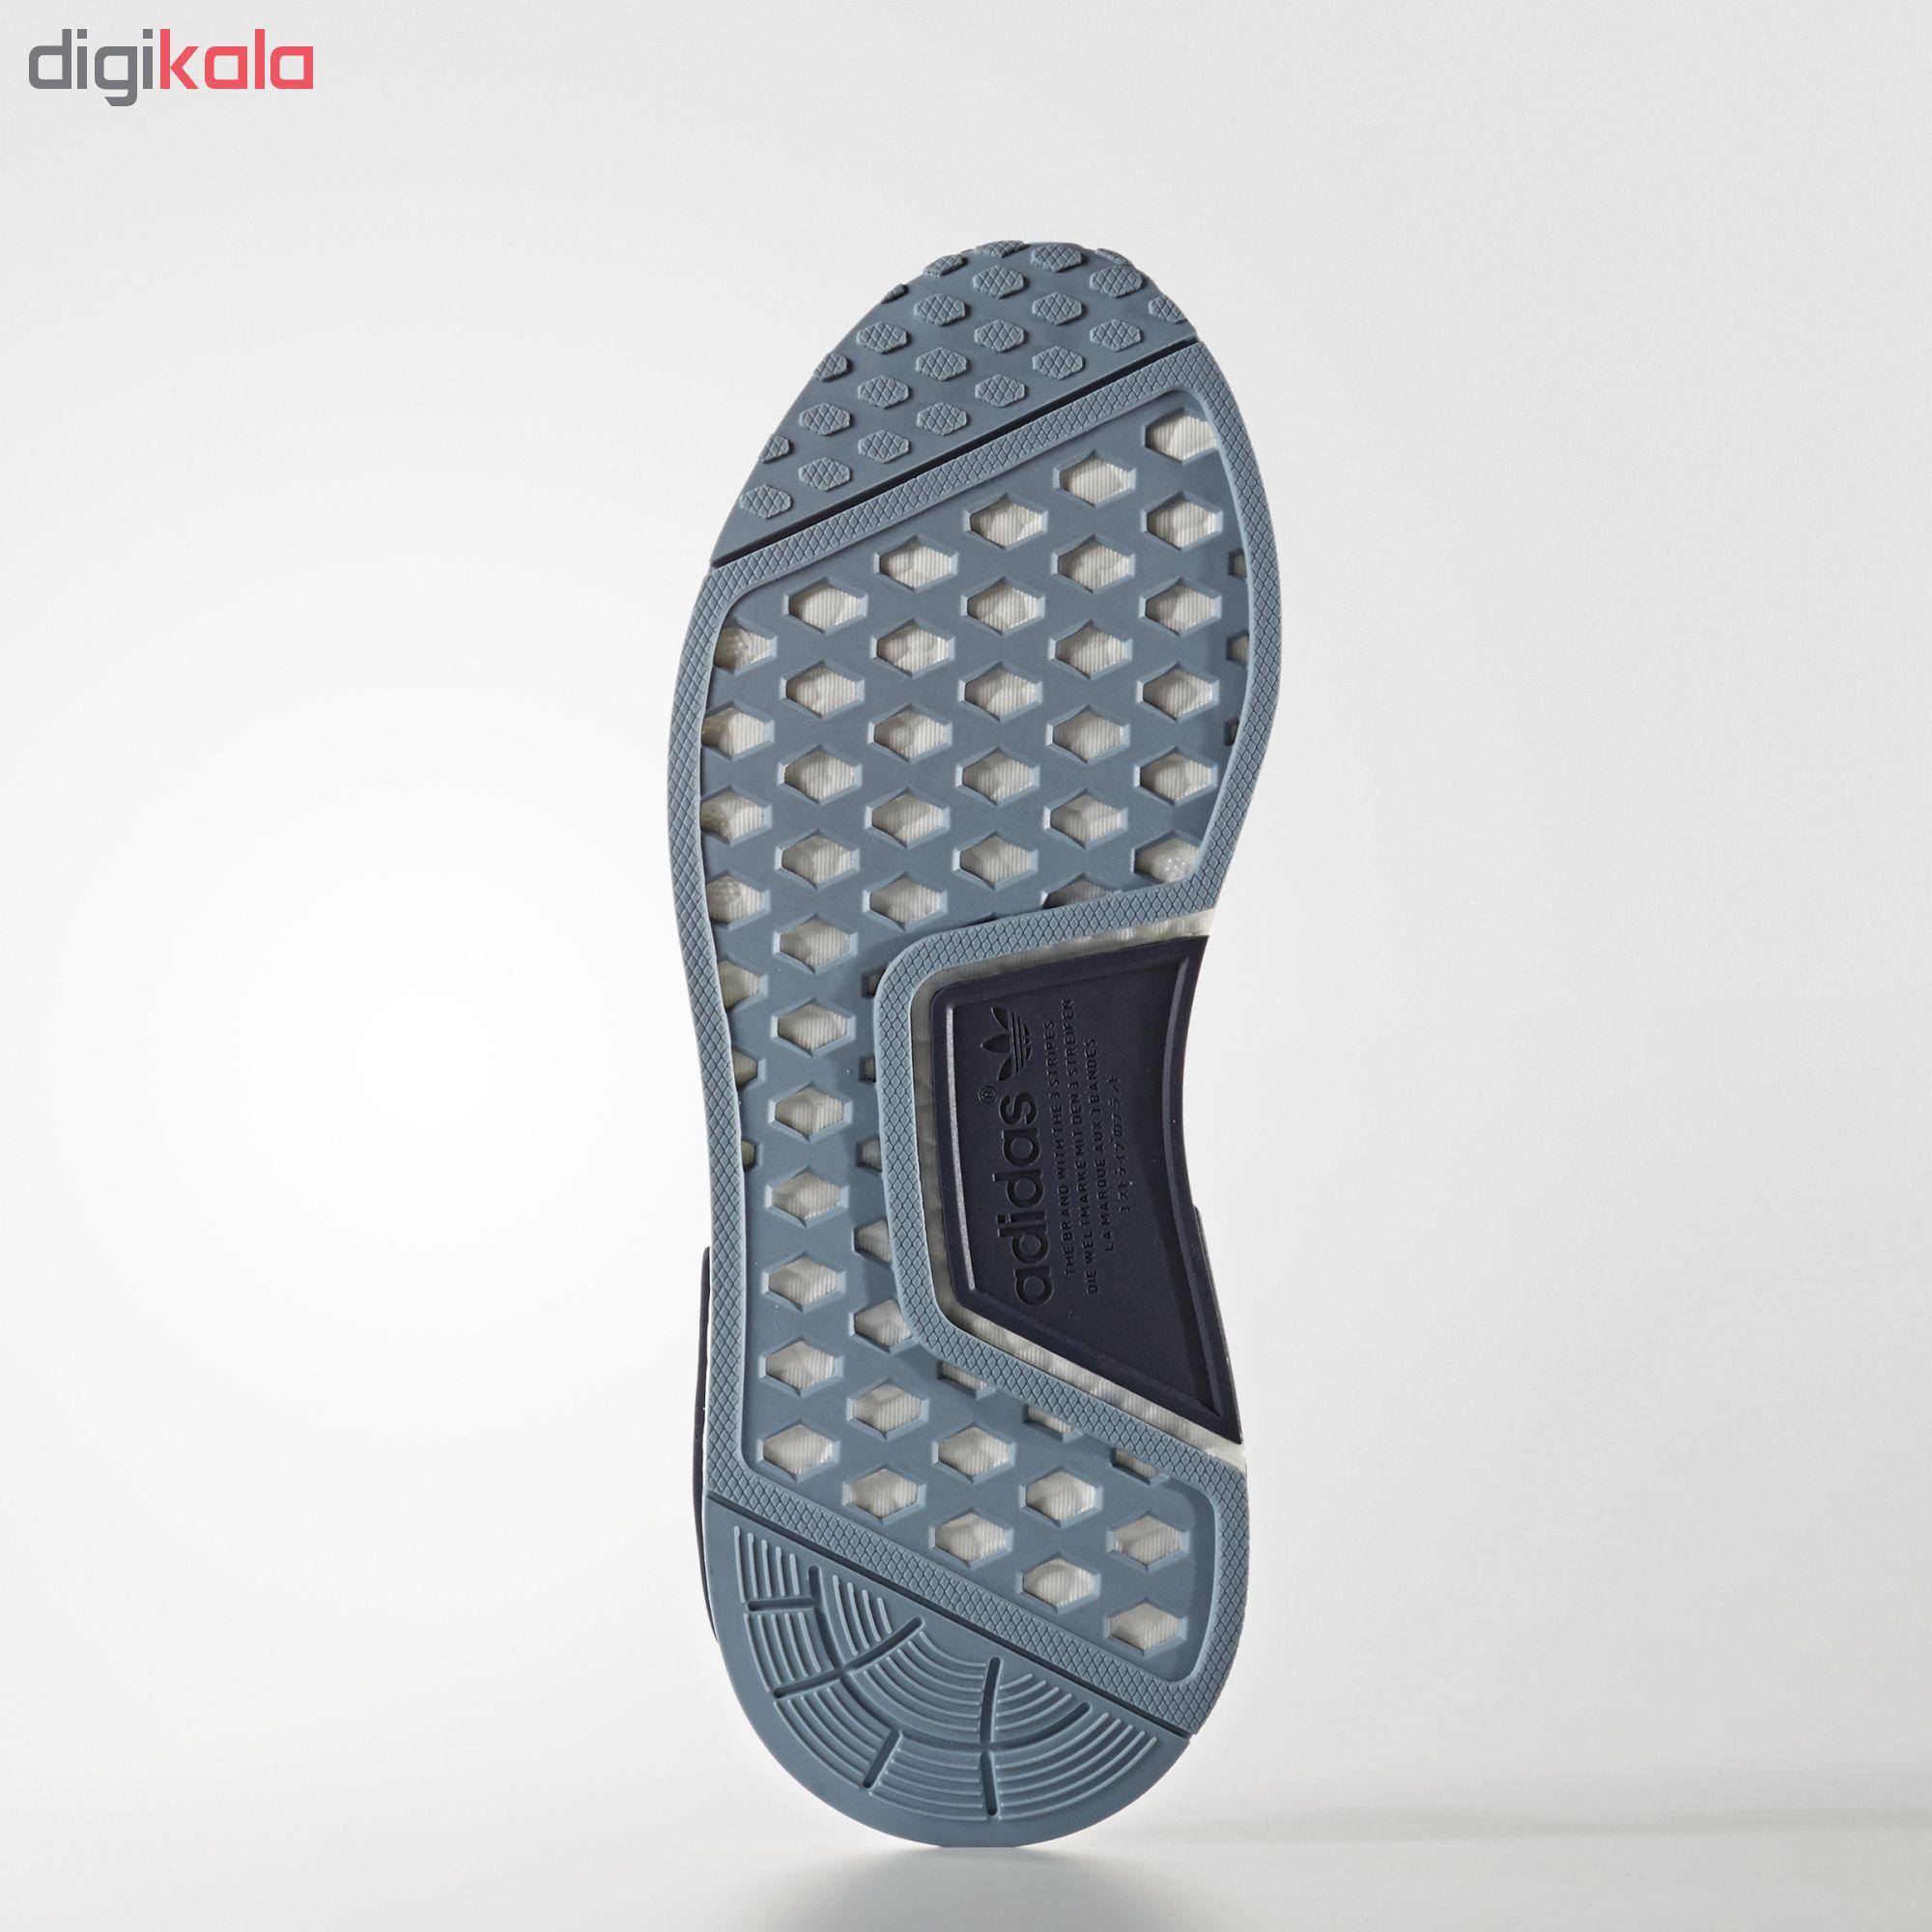 کفش راحتی زنانه آدیداس مدل nmd xr1 کد BA7754